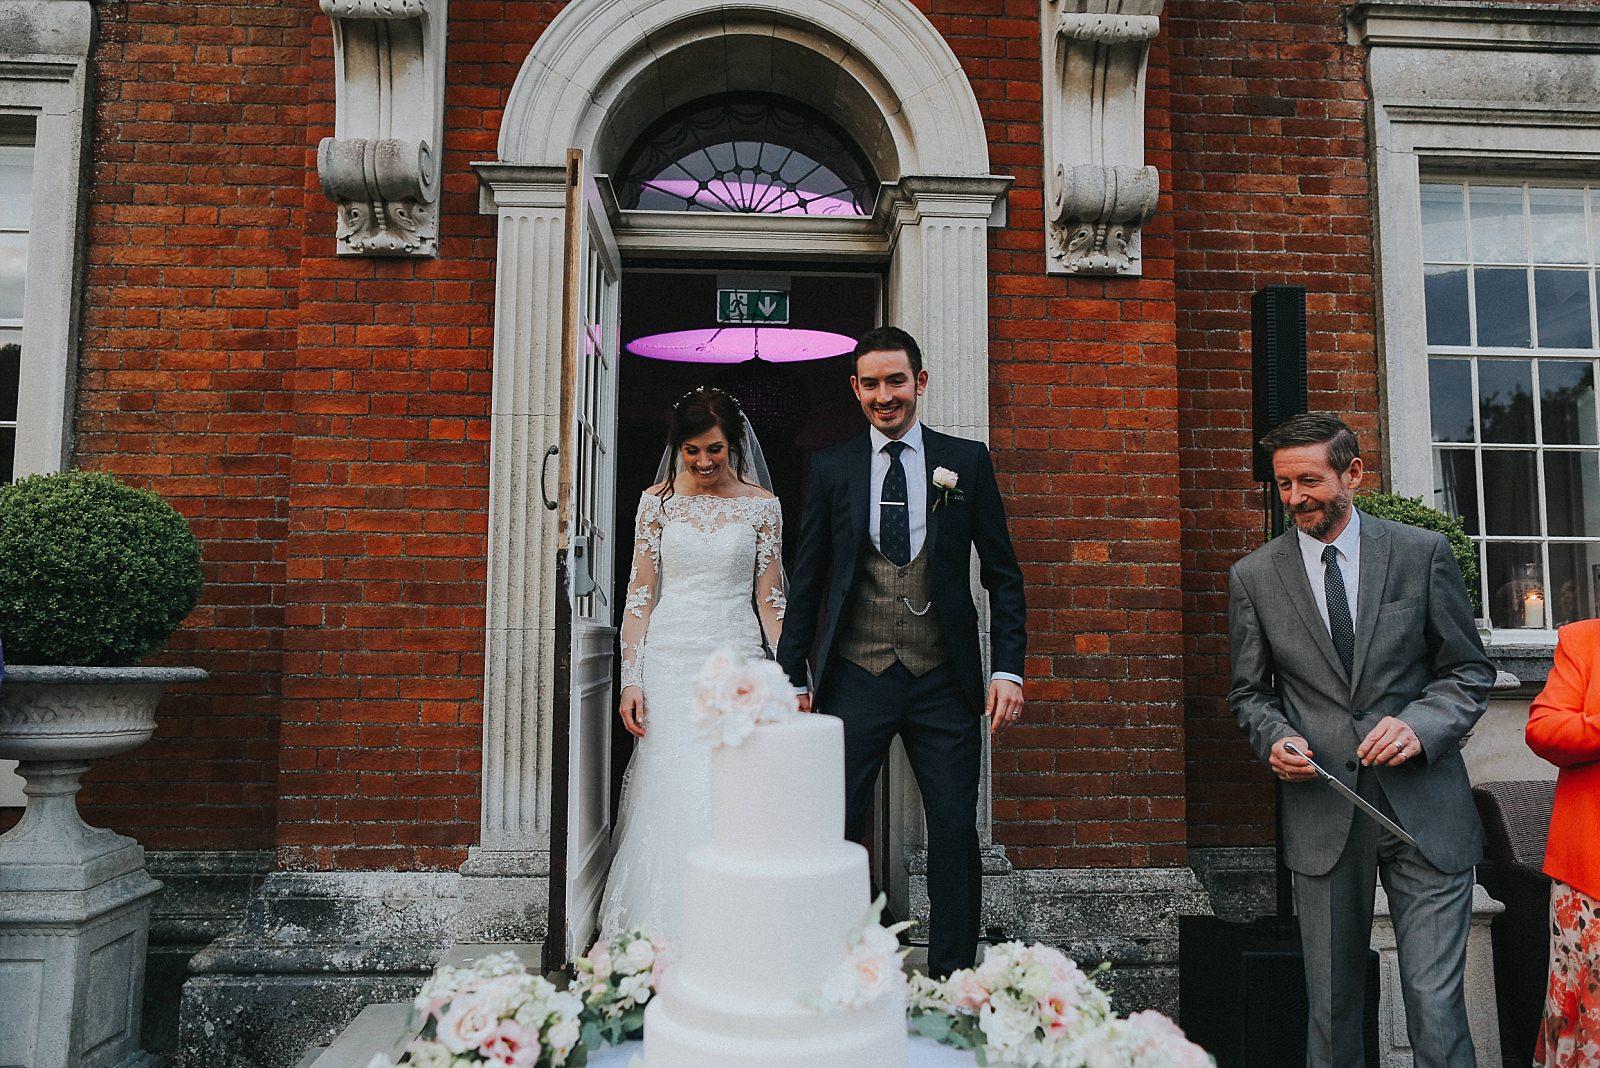 beautiful pink frosting wedding cake